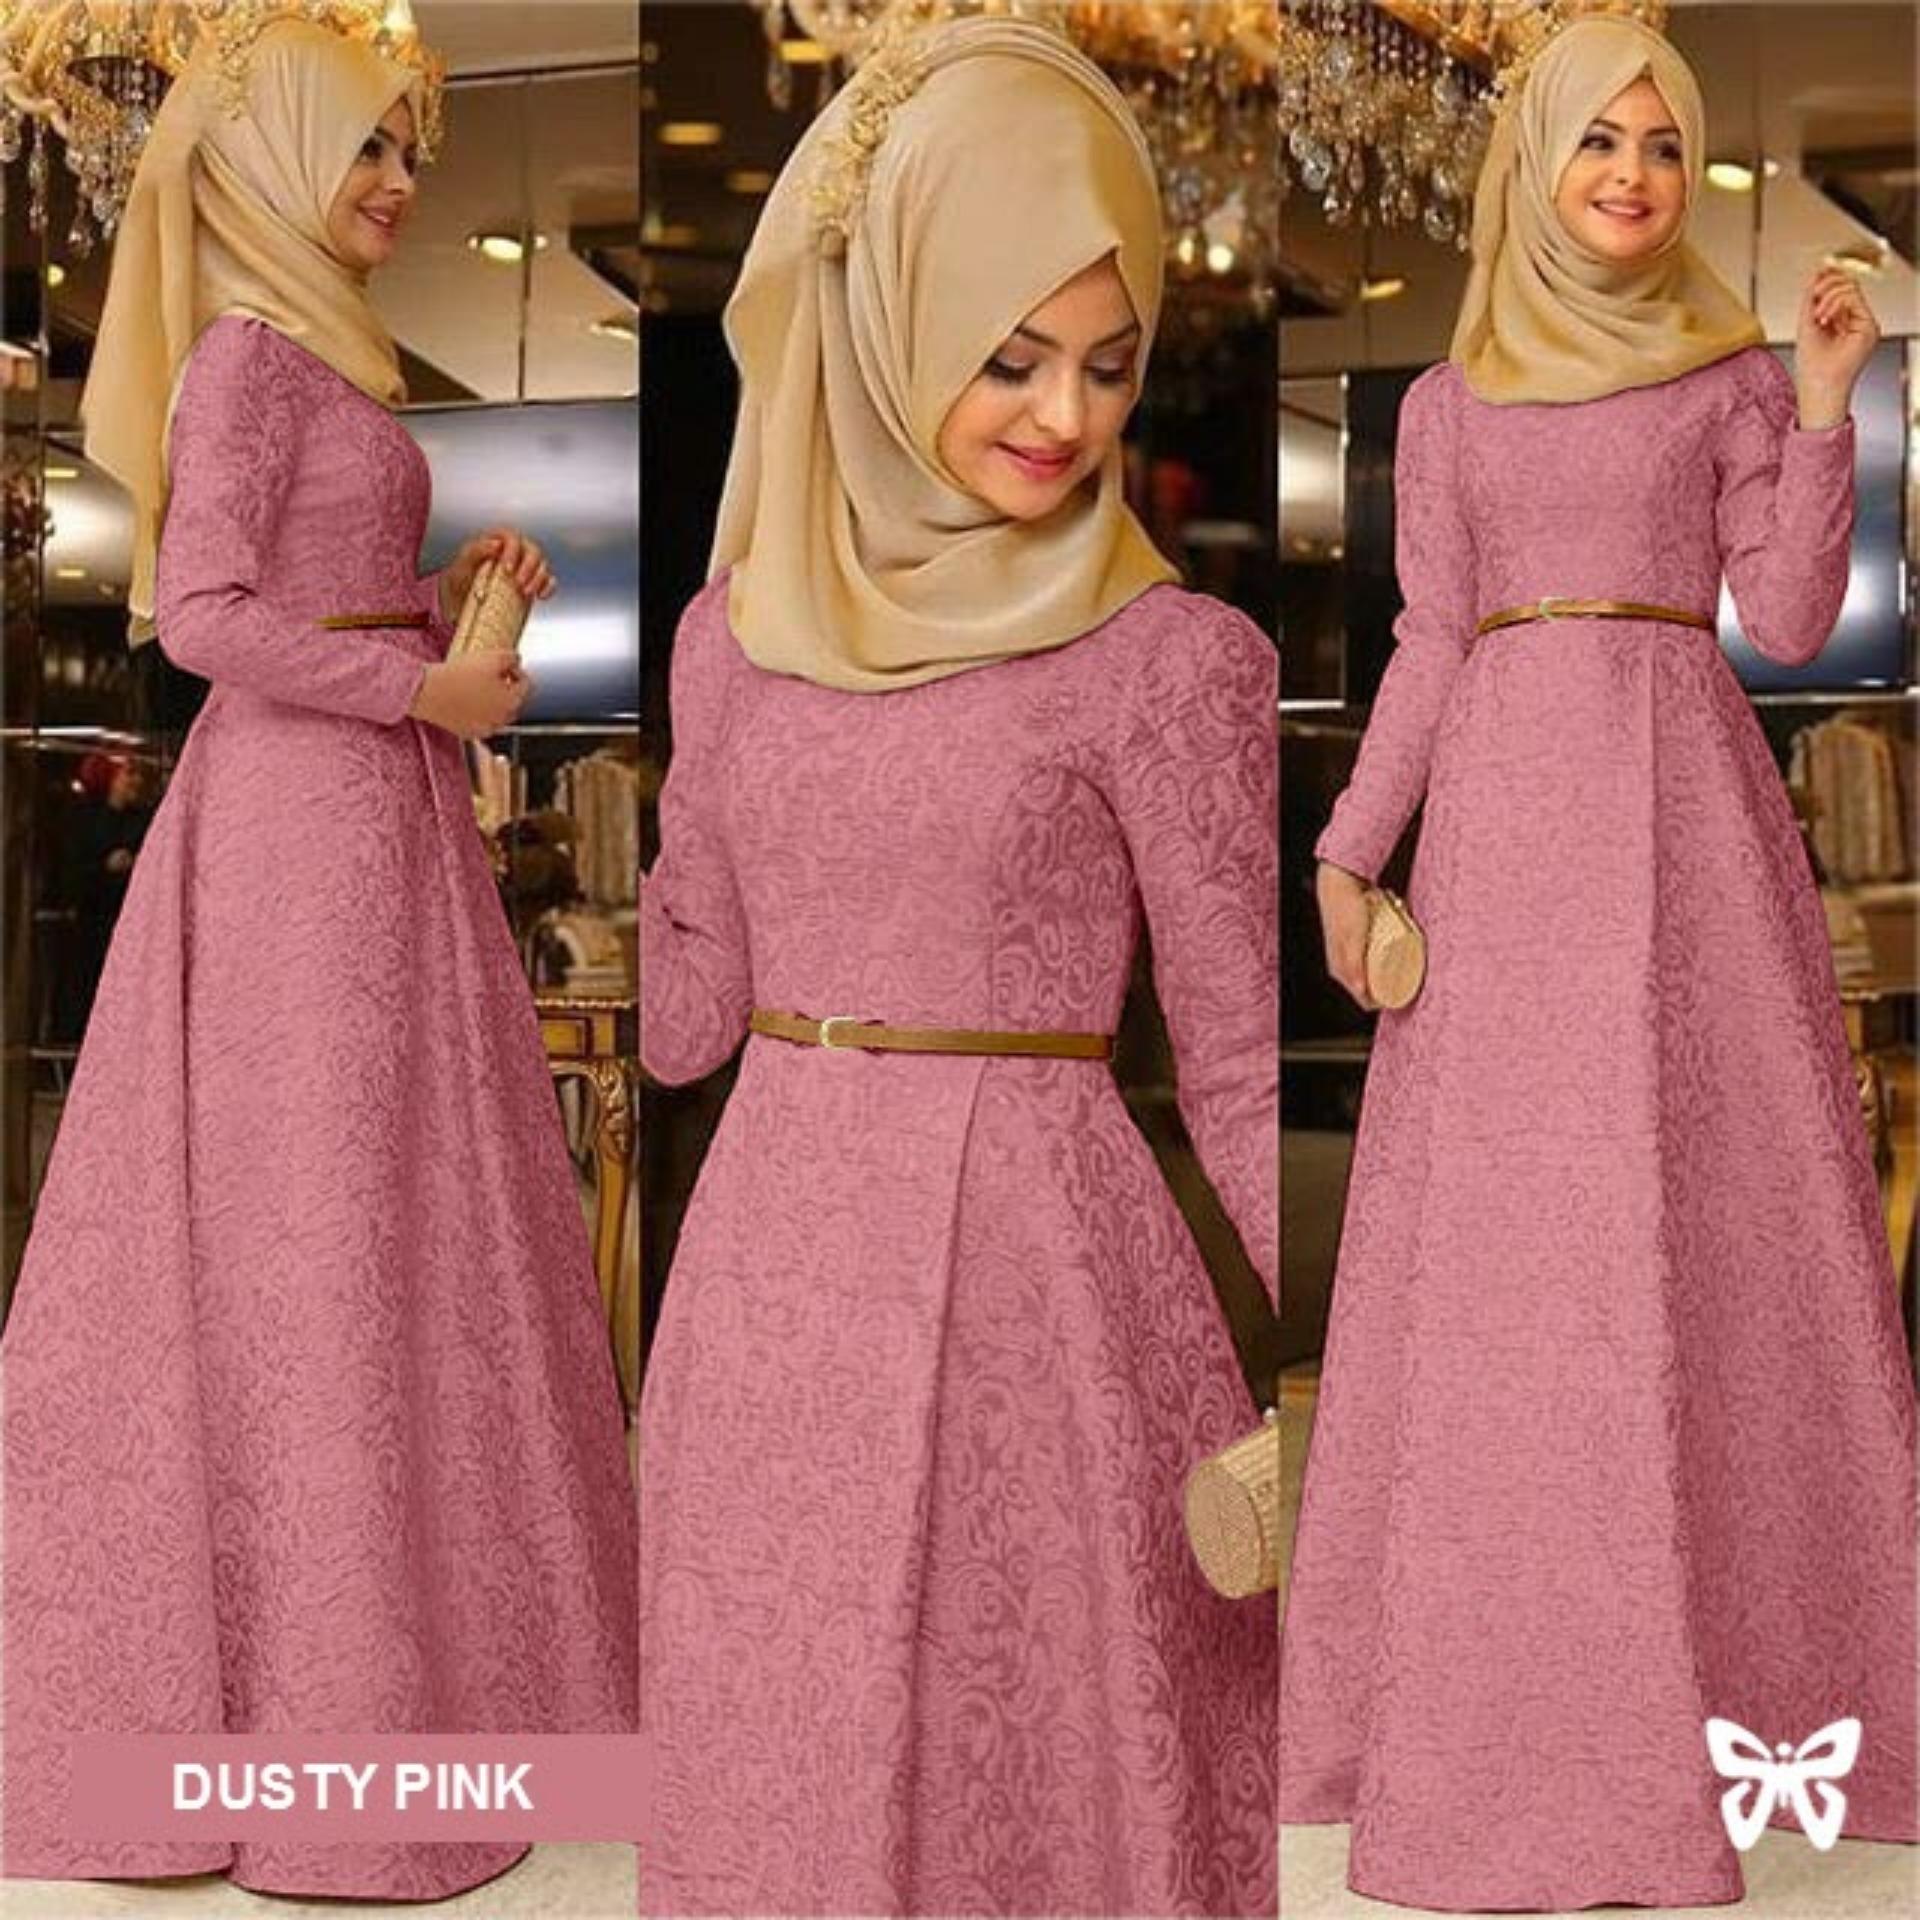 Flavia Store Maxi Dress Lengan Panjang Set 3 in 1 FS0224 - DUSTY PINK / Gamis Syari / Gaun Pesta Muslimah / Baju Muslim Wanita Syar'i / Hijab / Srzamirah